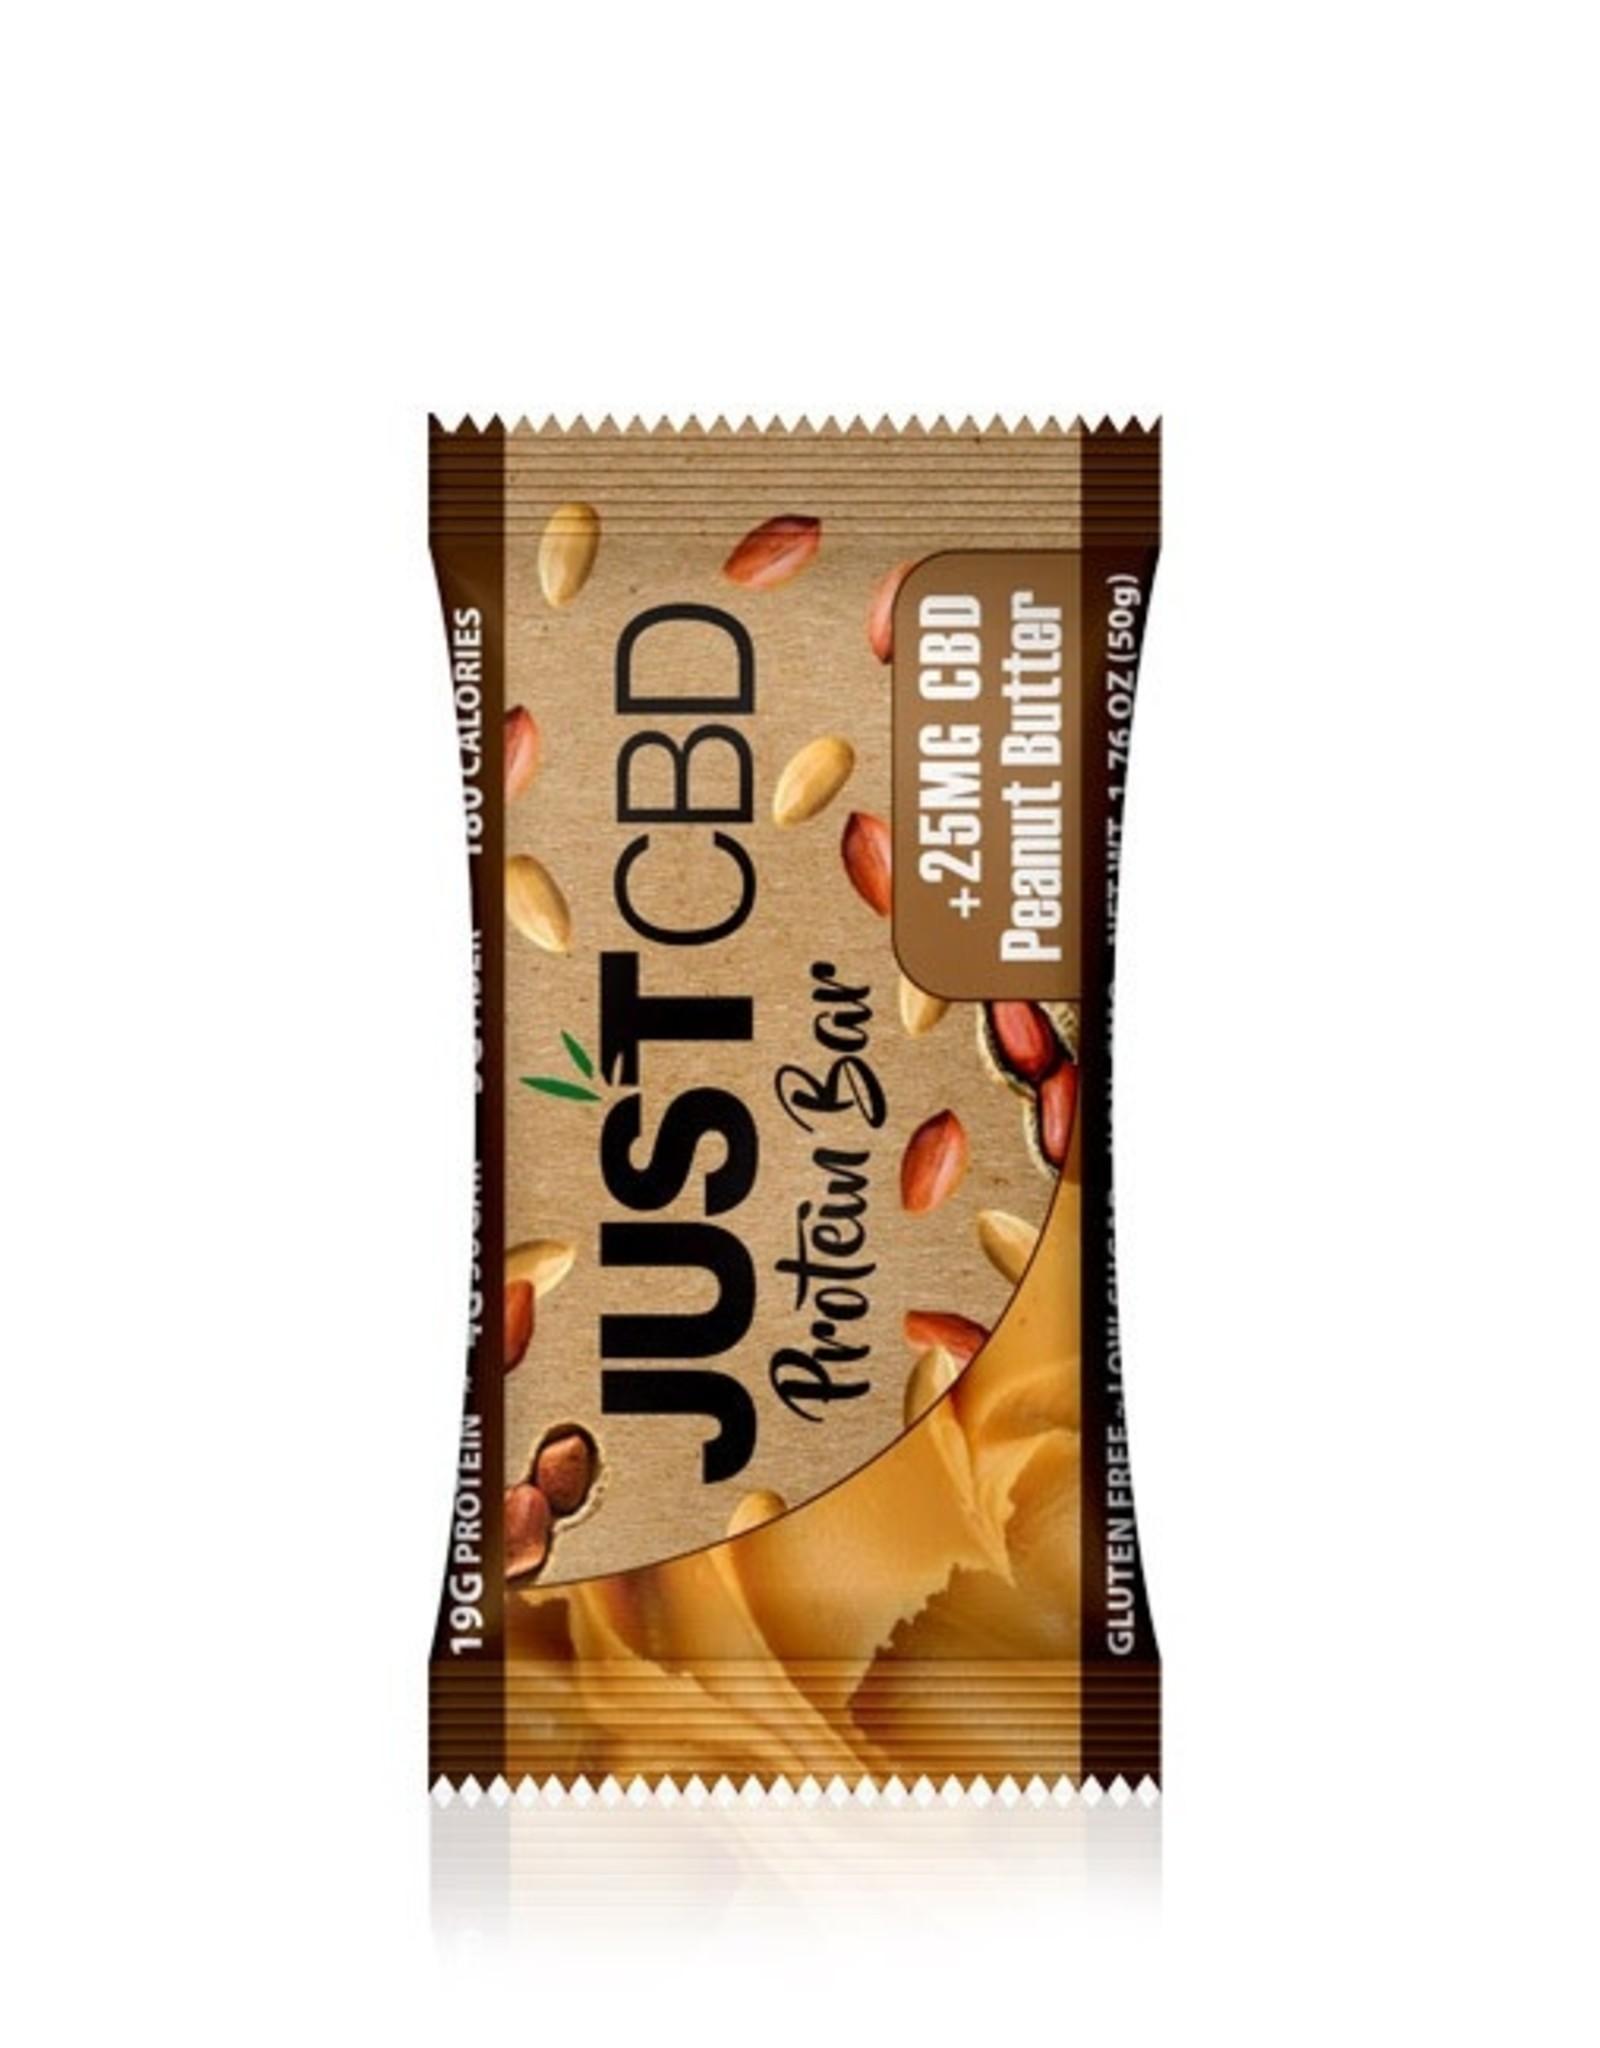 JustCBD Peanut Butter Protein Bar